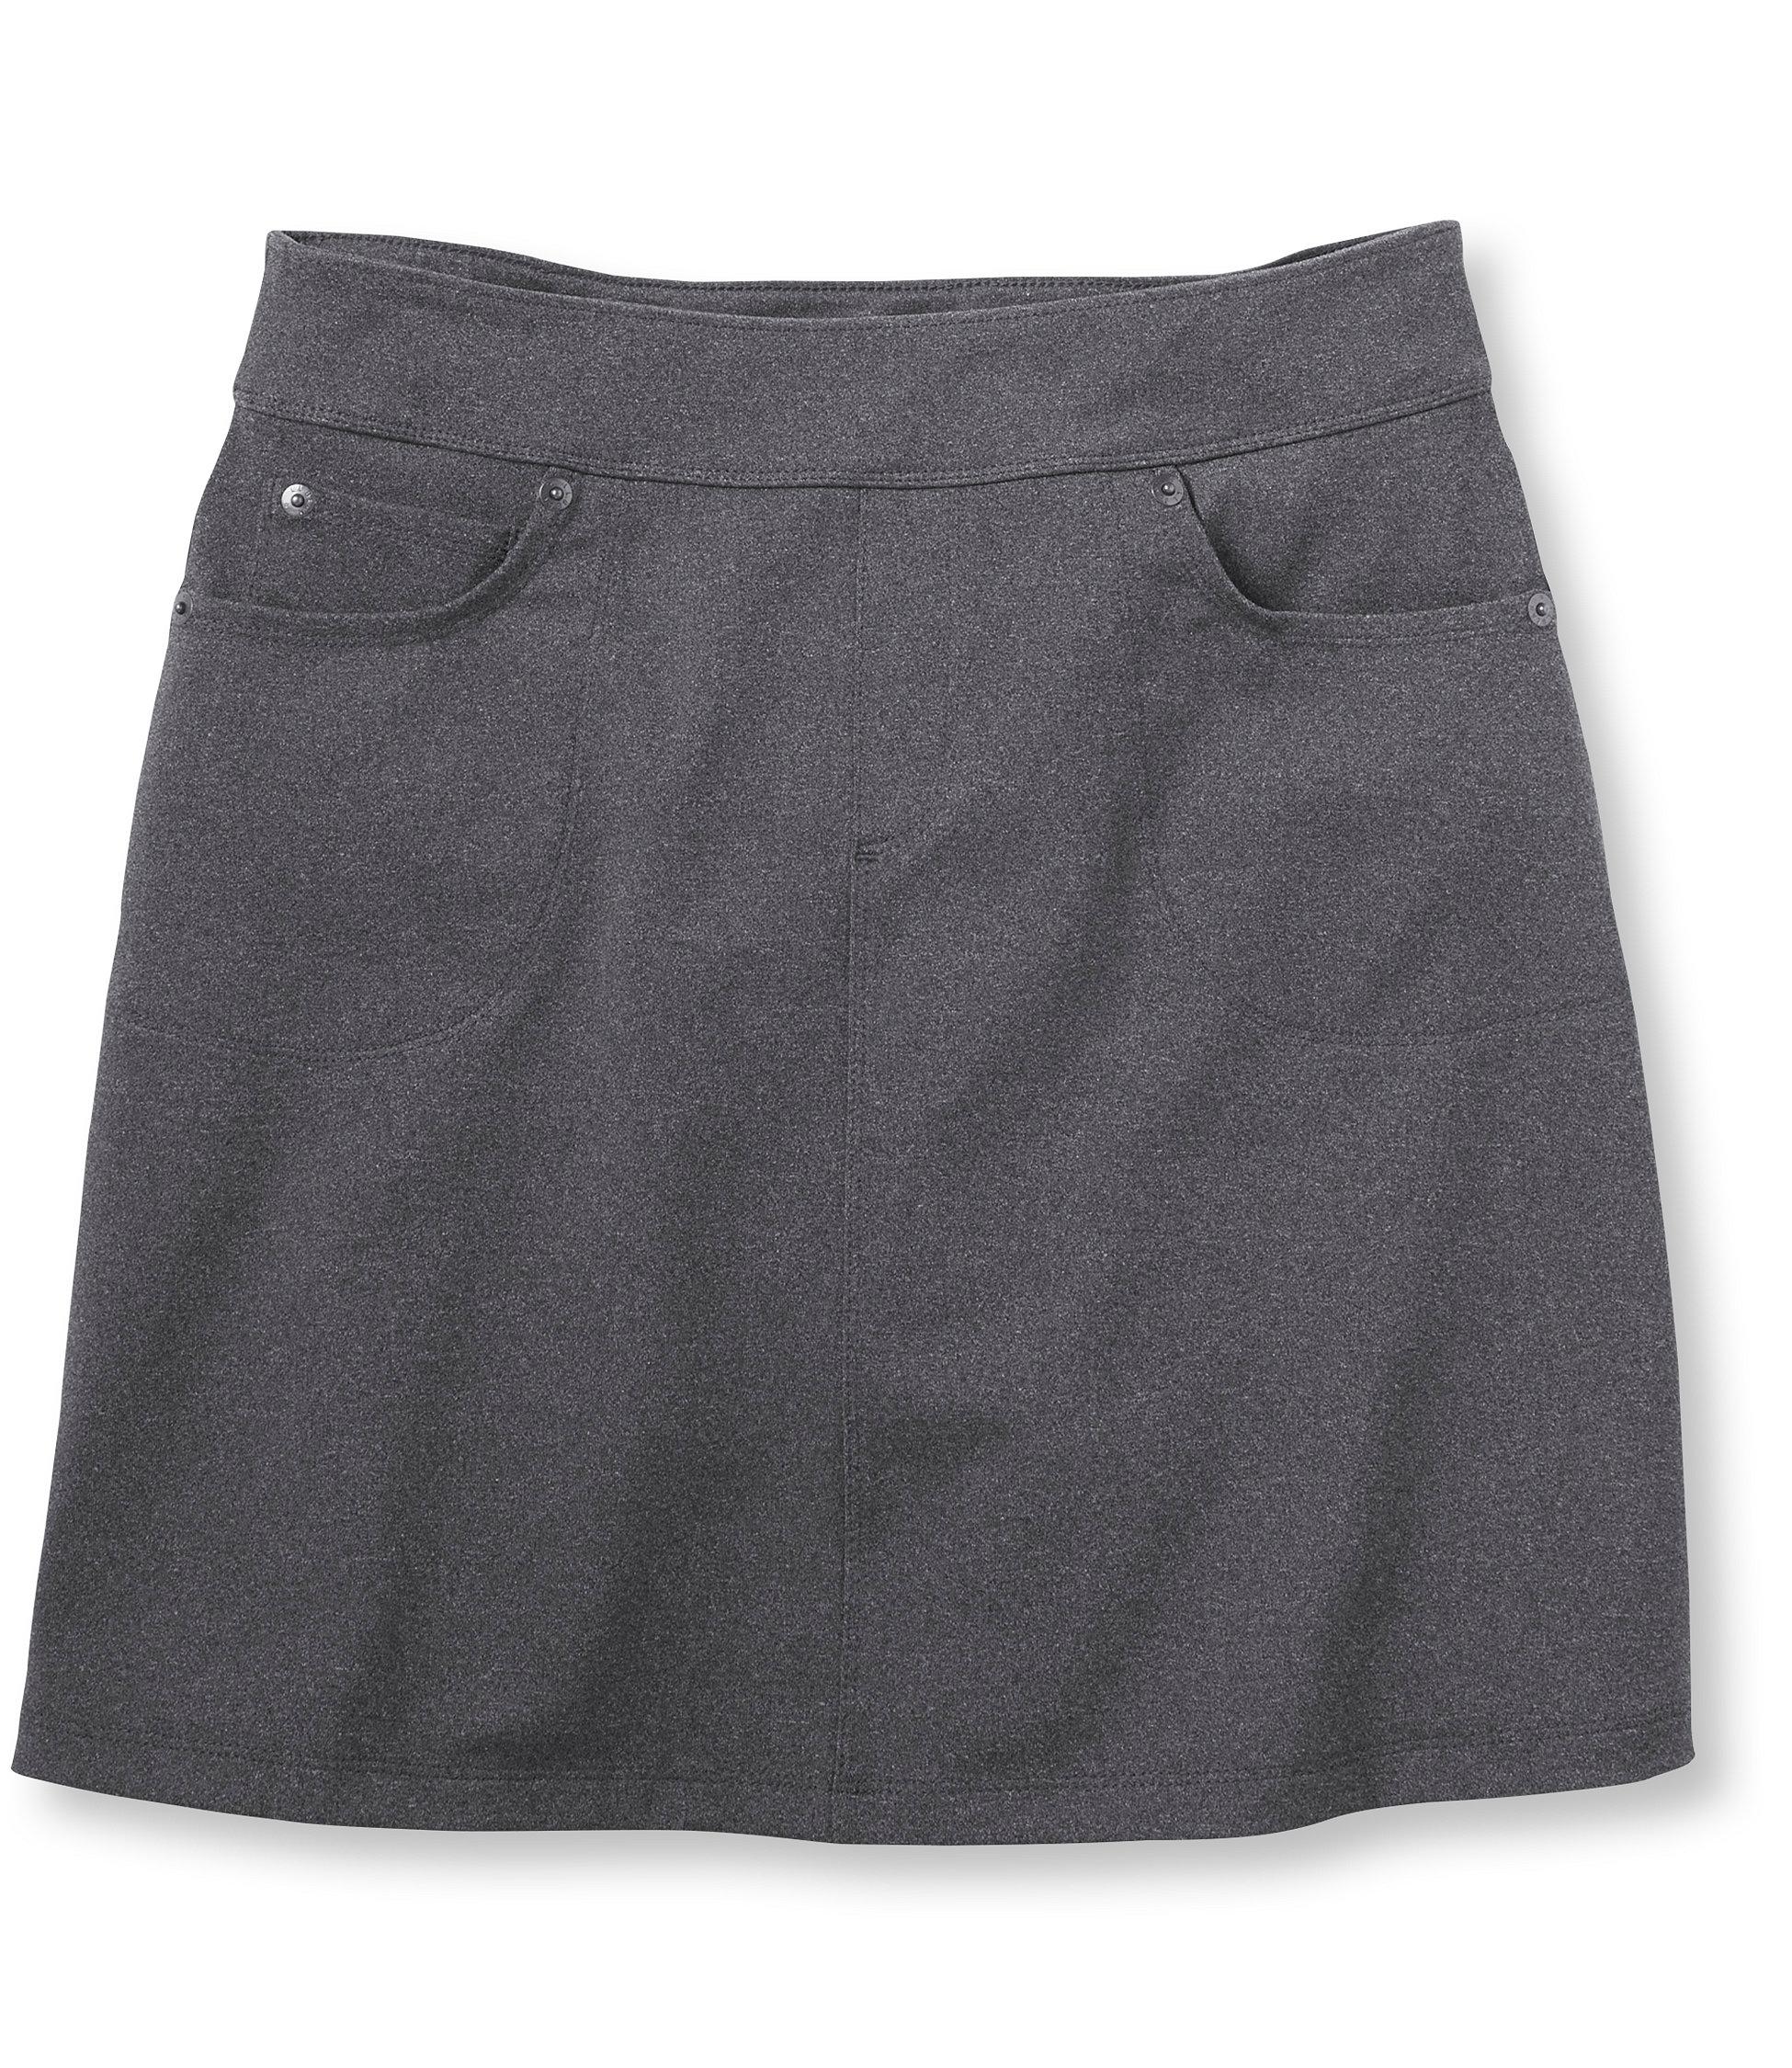 photo: L.L.Bean 5-Pocket Performance Skort hiking skirt